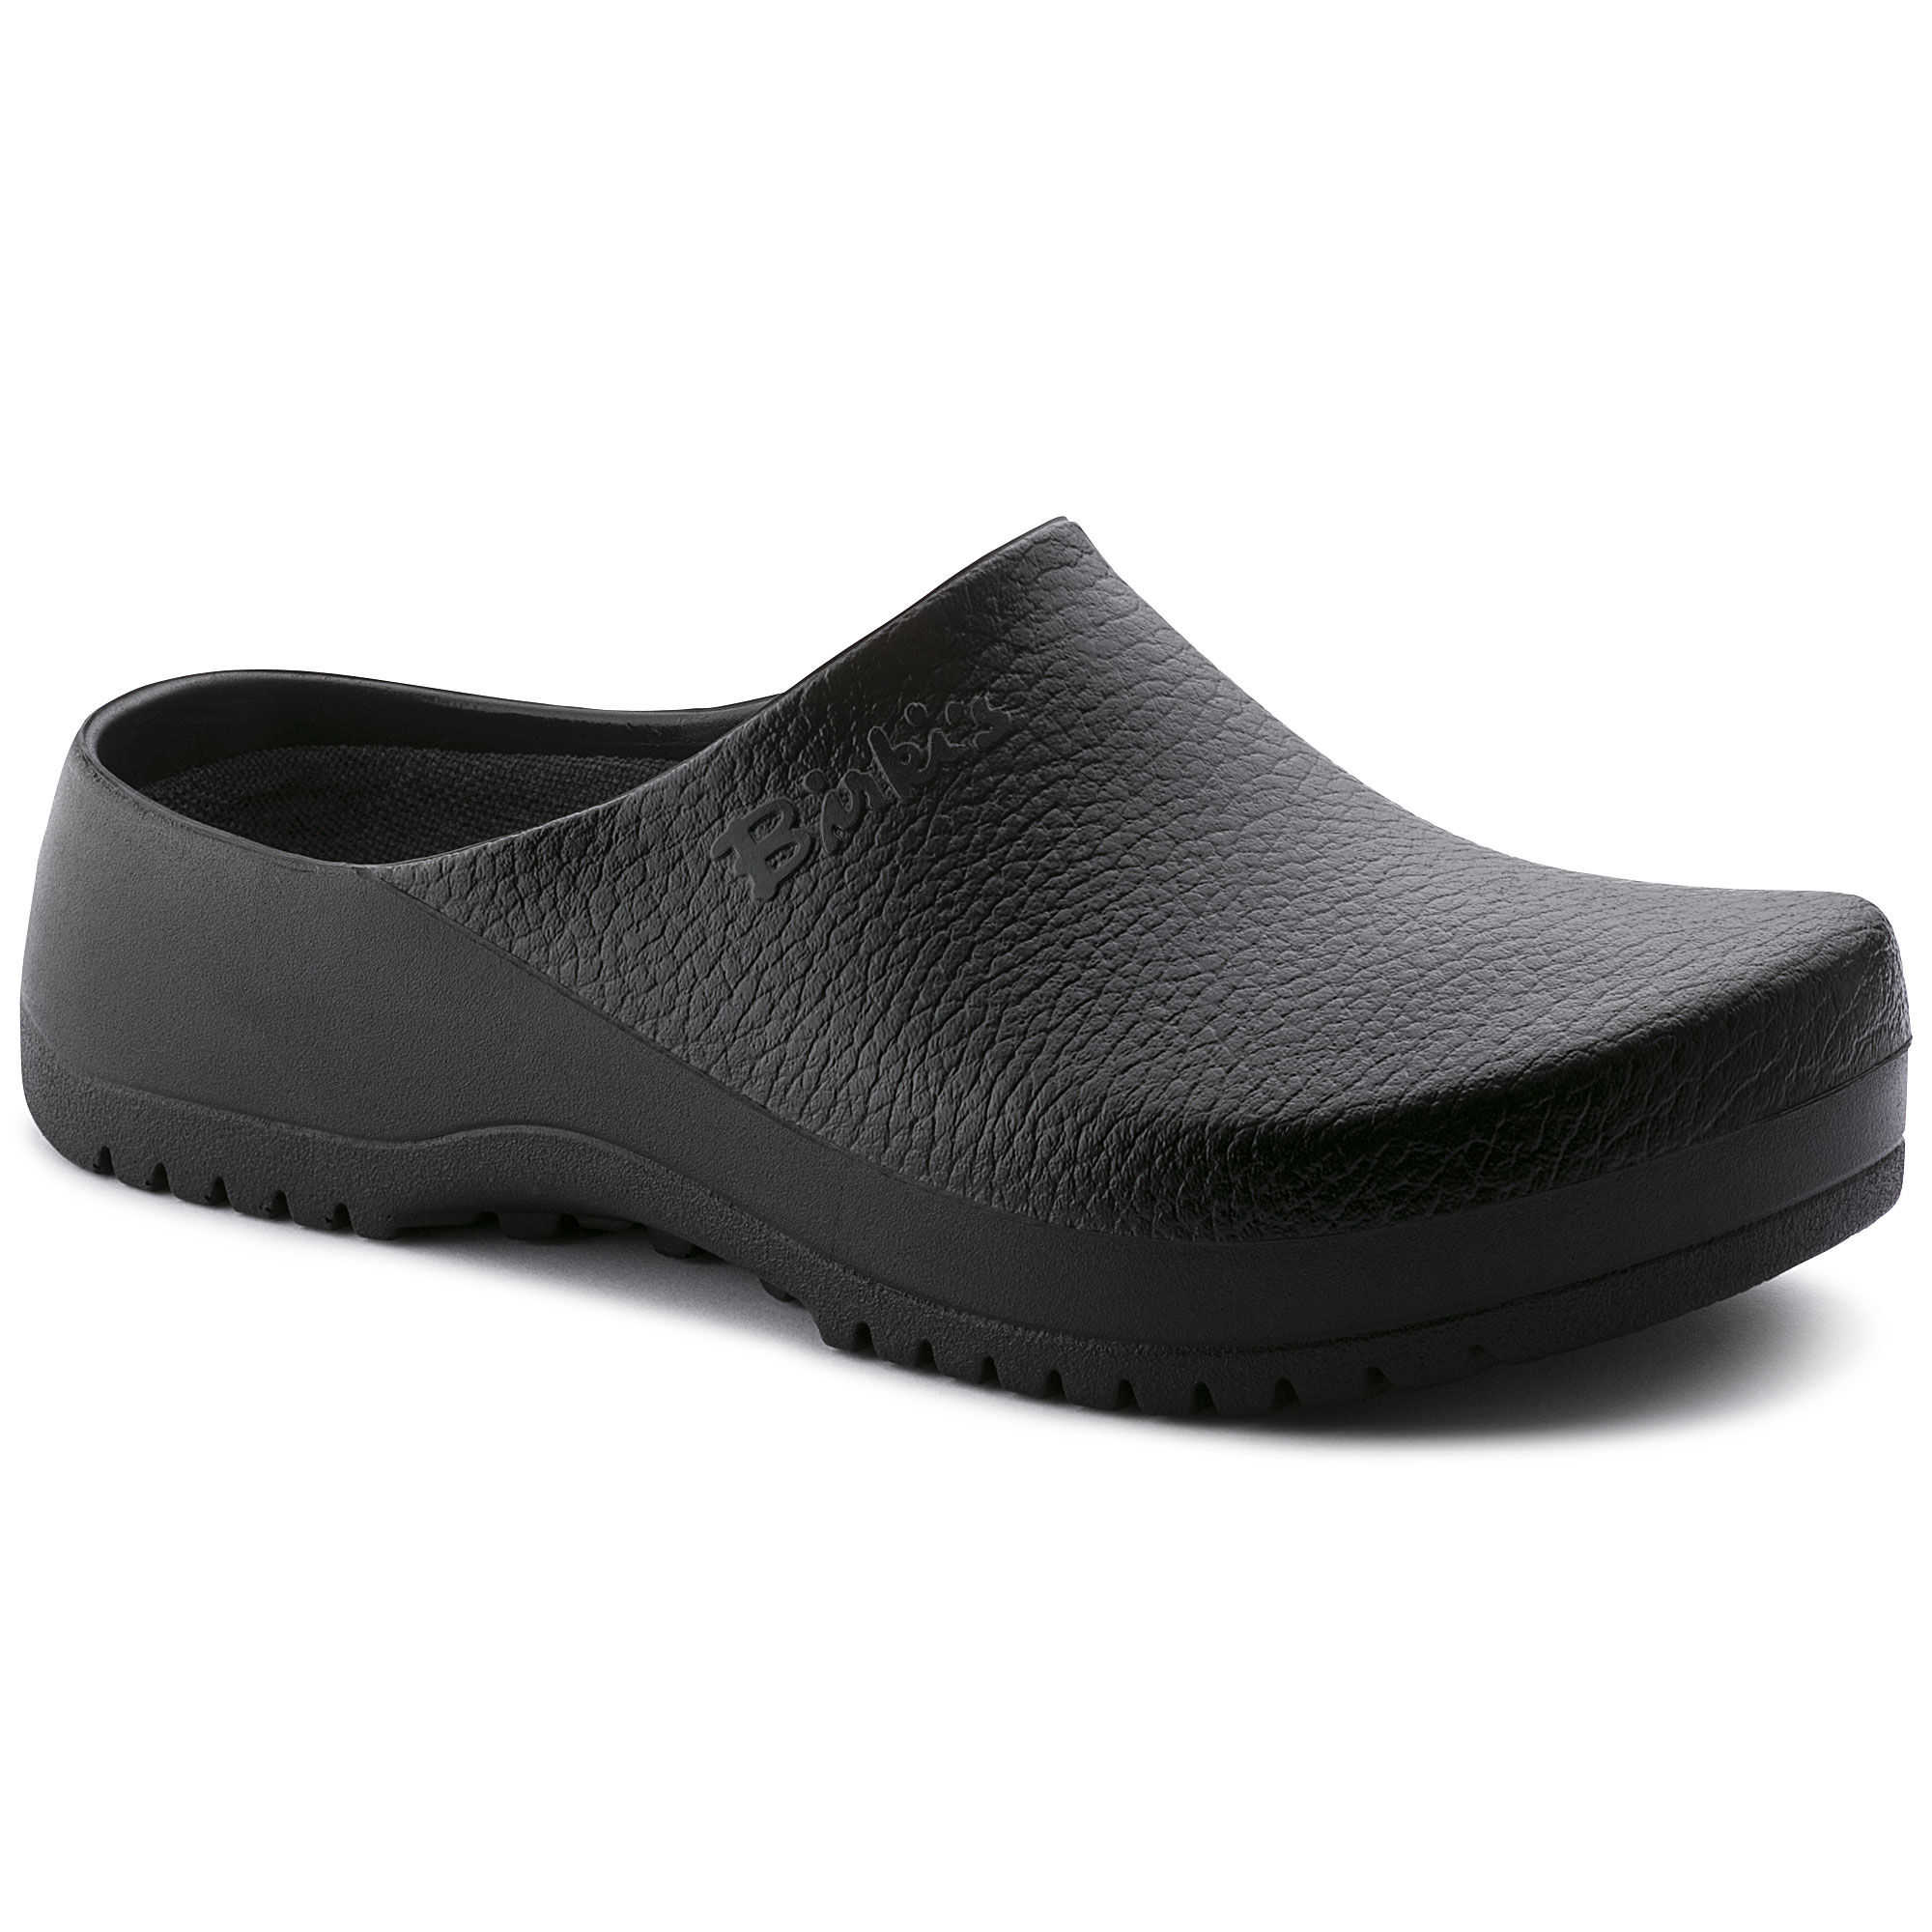 birkenstock schuhe klettverschluss,rieker herren sandale